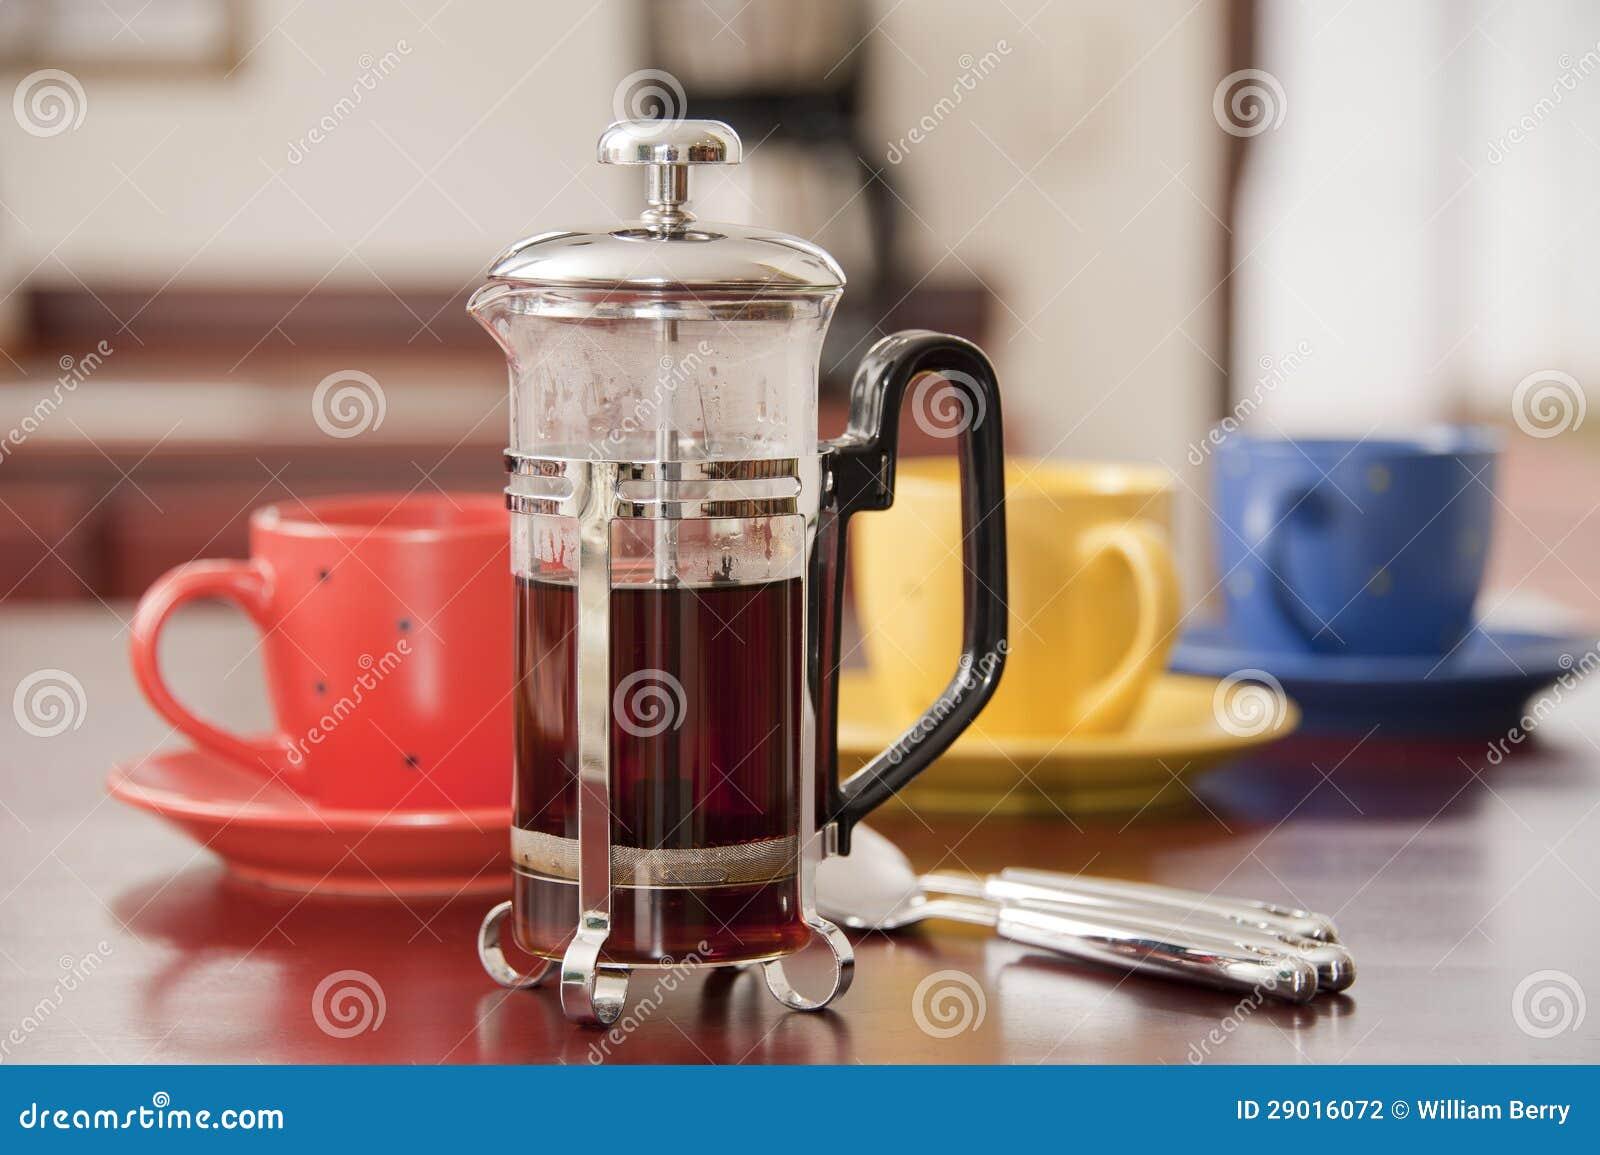 Fresh Brewed Coffee Stock Photography - Image: 29016072